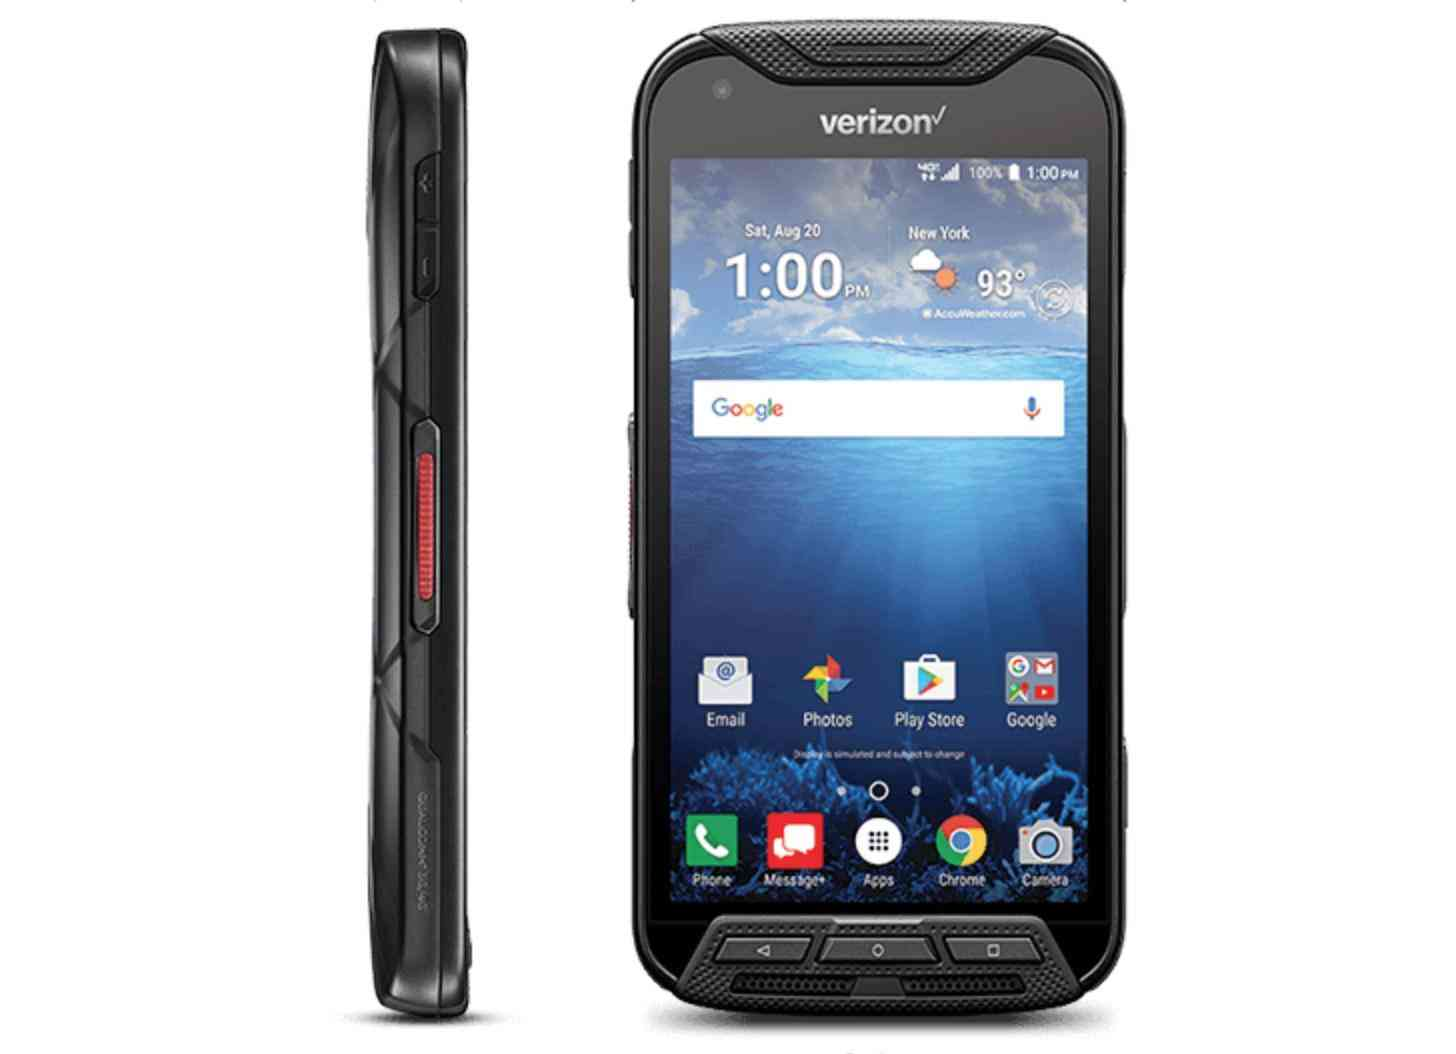 Kyocera DuraForce Pro Verizon Wireless official